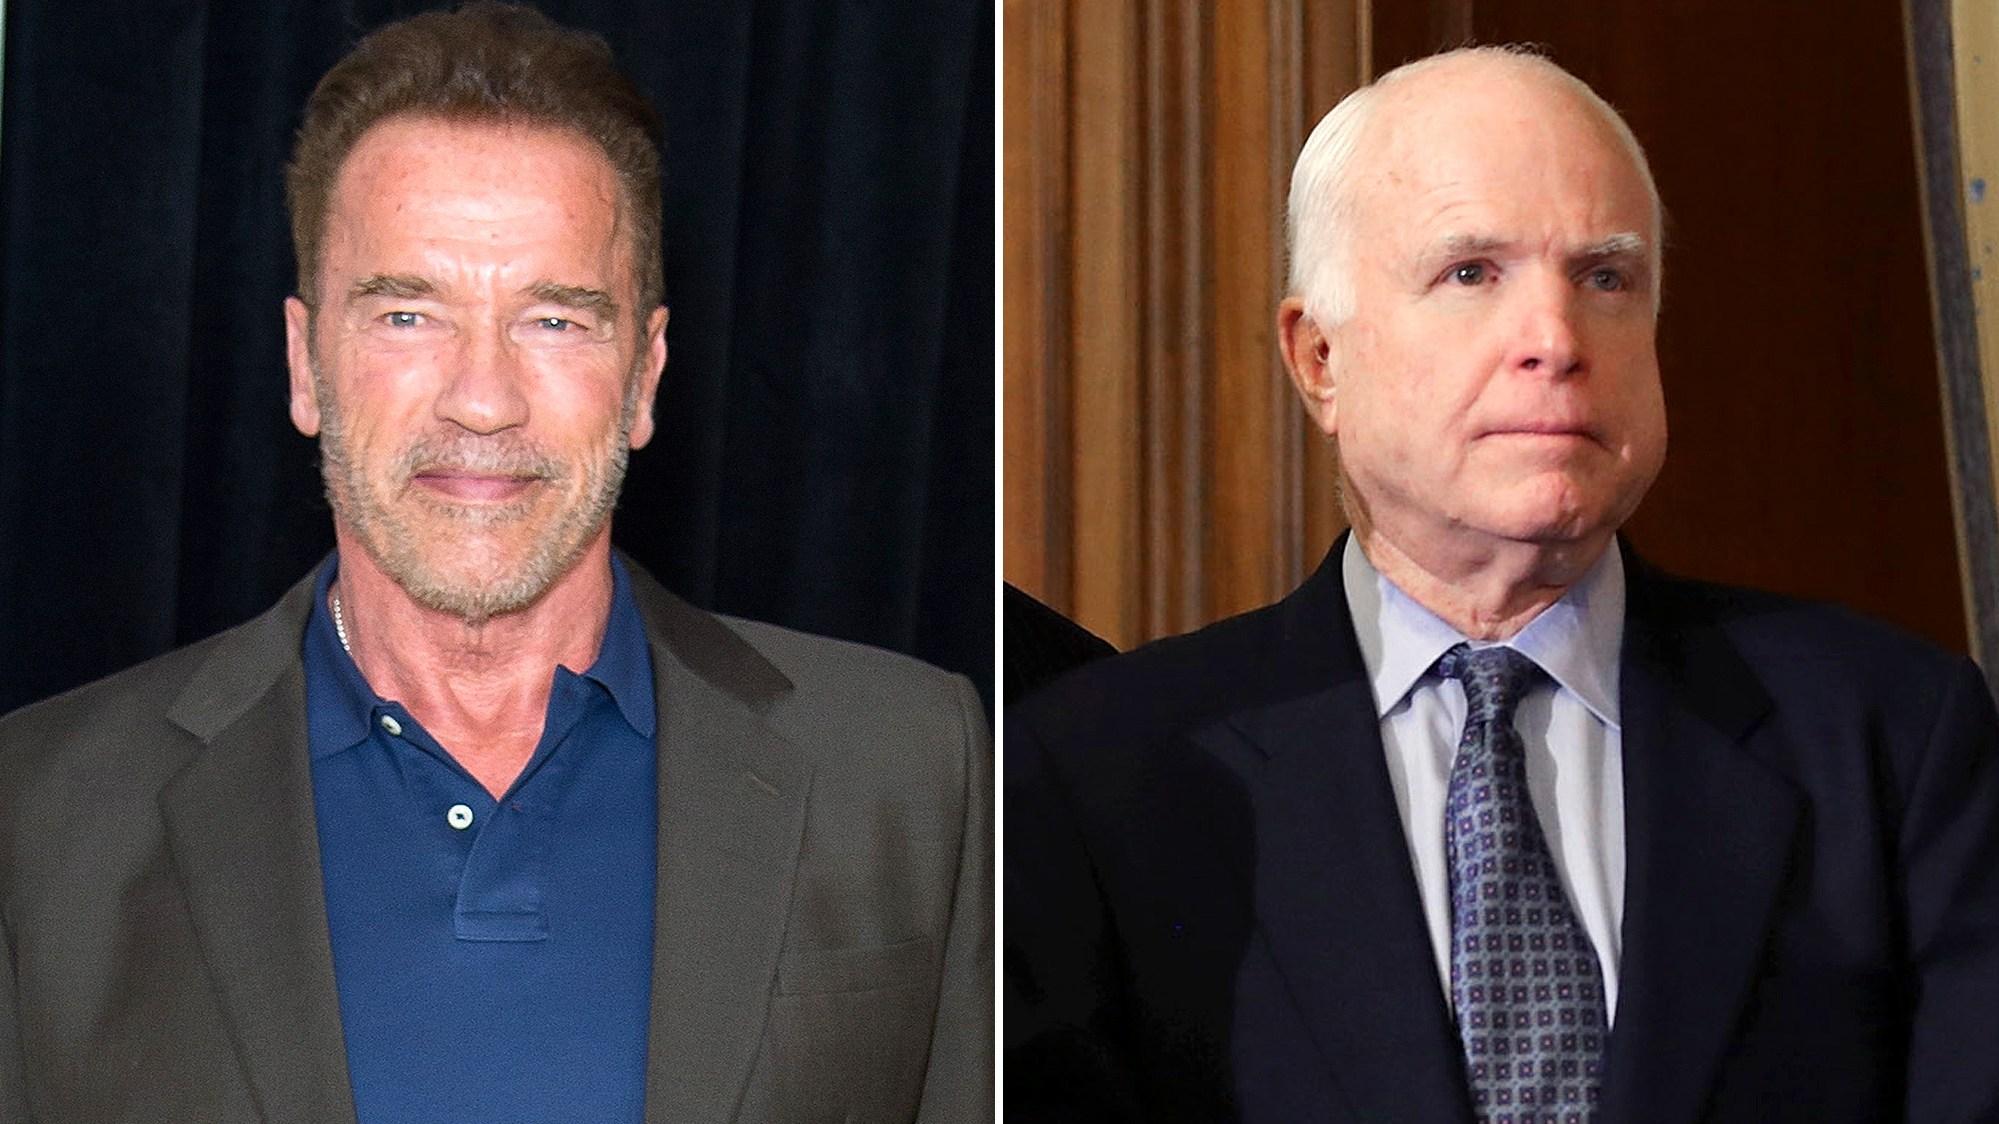 Arnold Schwarzenegger and John McCain